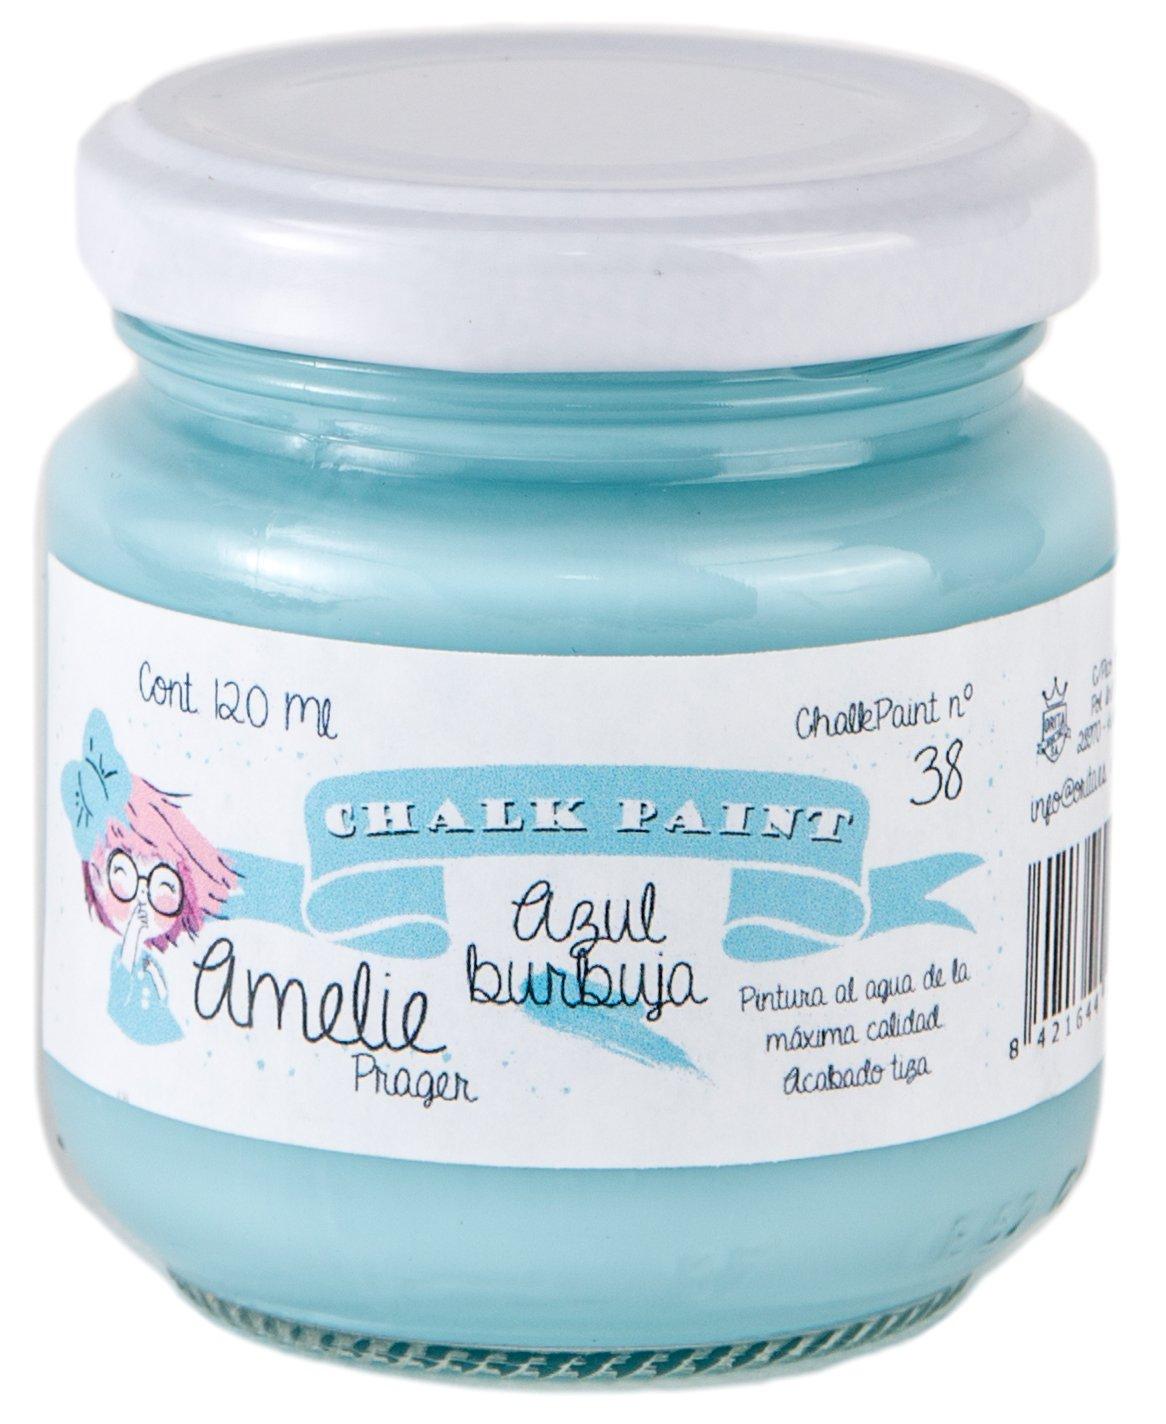 Amelie Prager 120-38 Pintura a la Tiza, Azul Burbuja, 120 ml